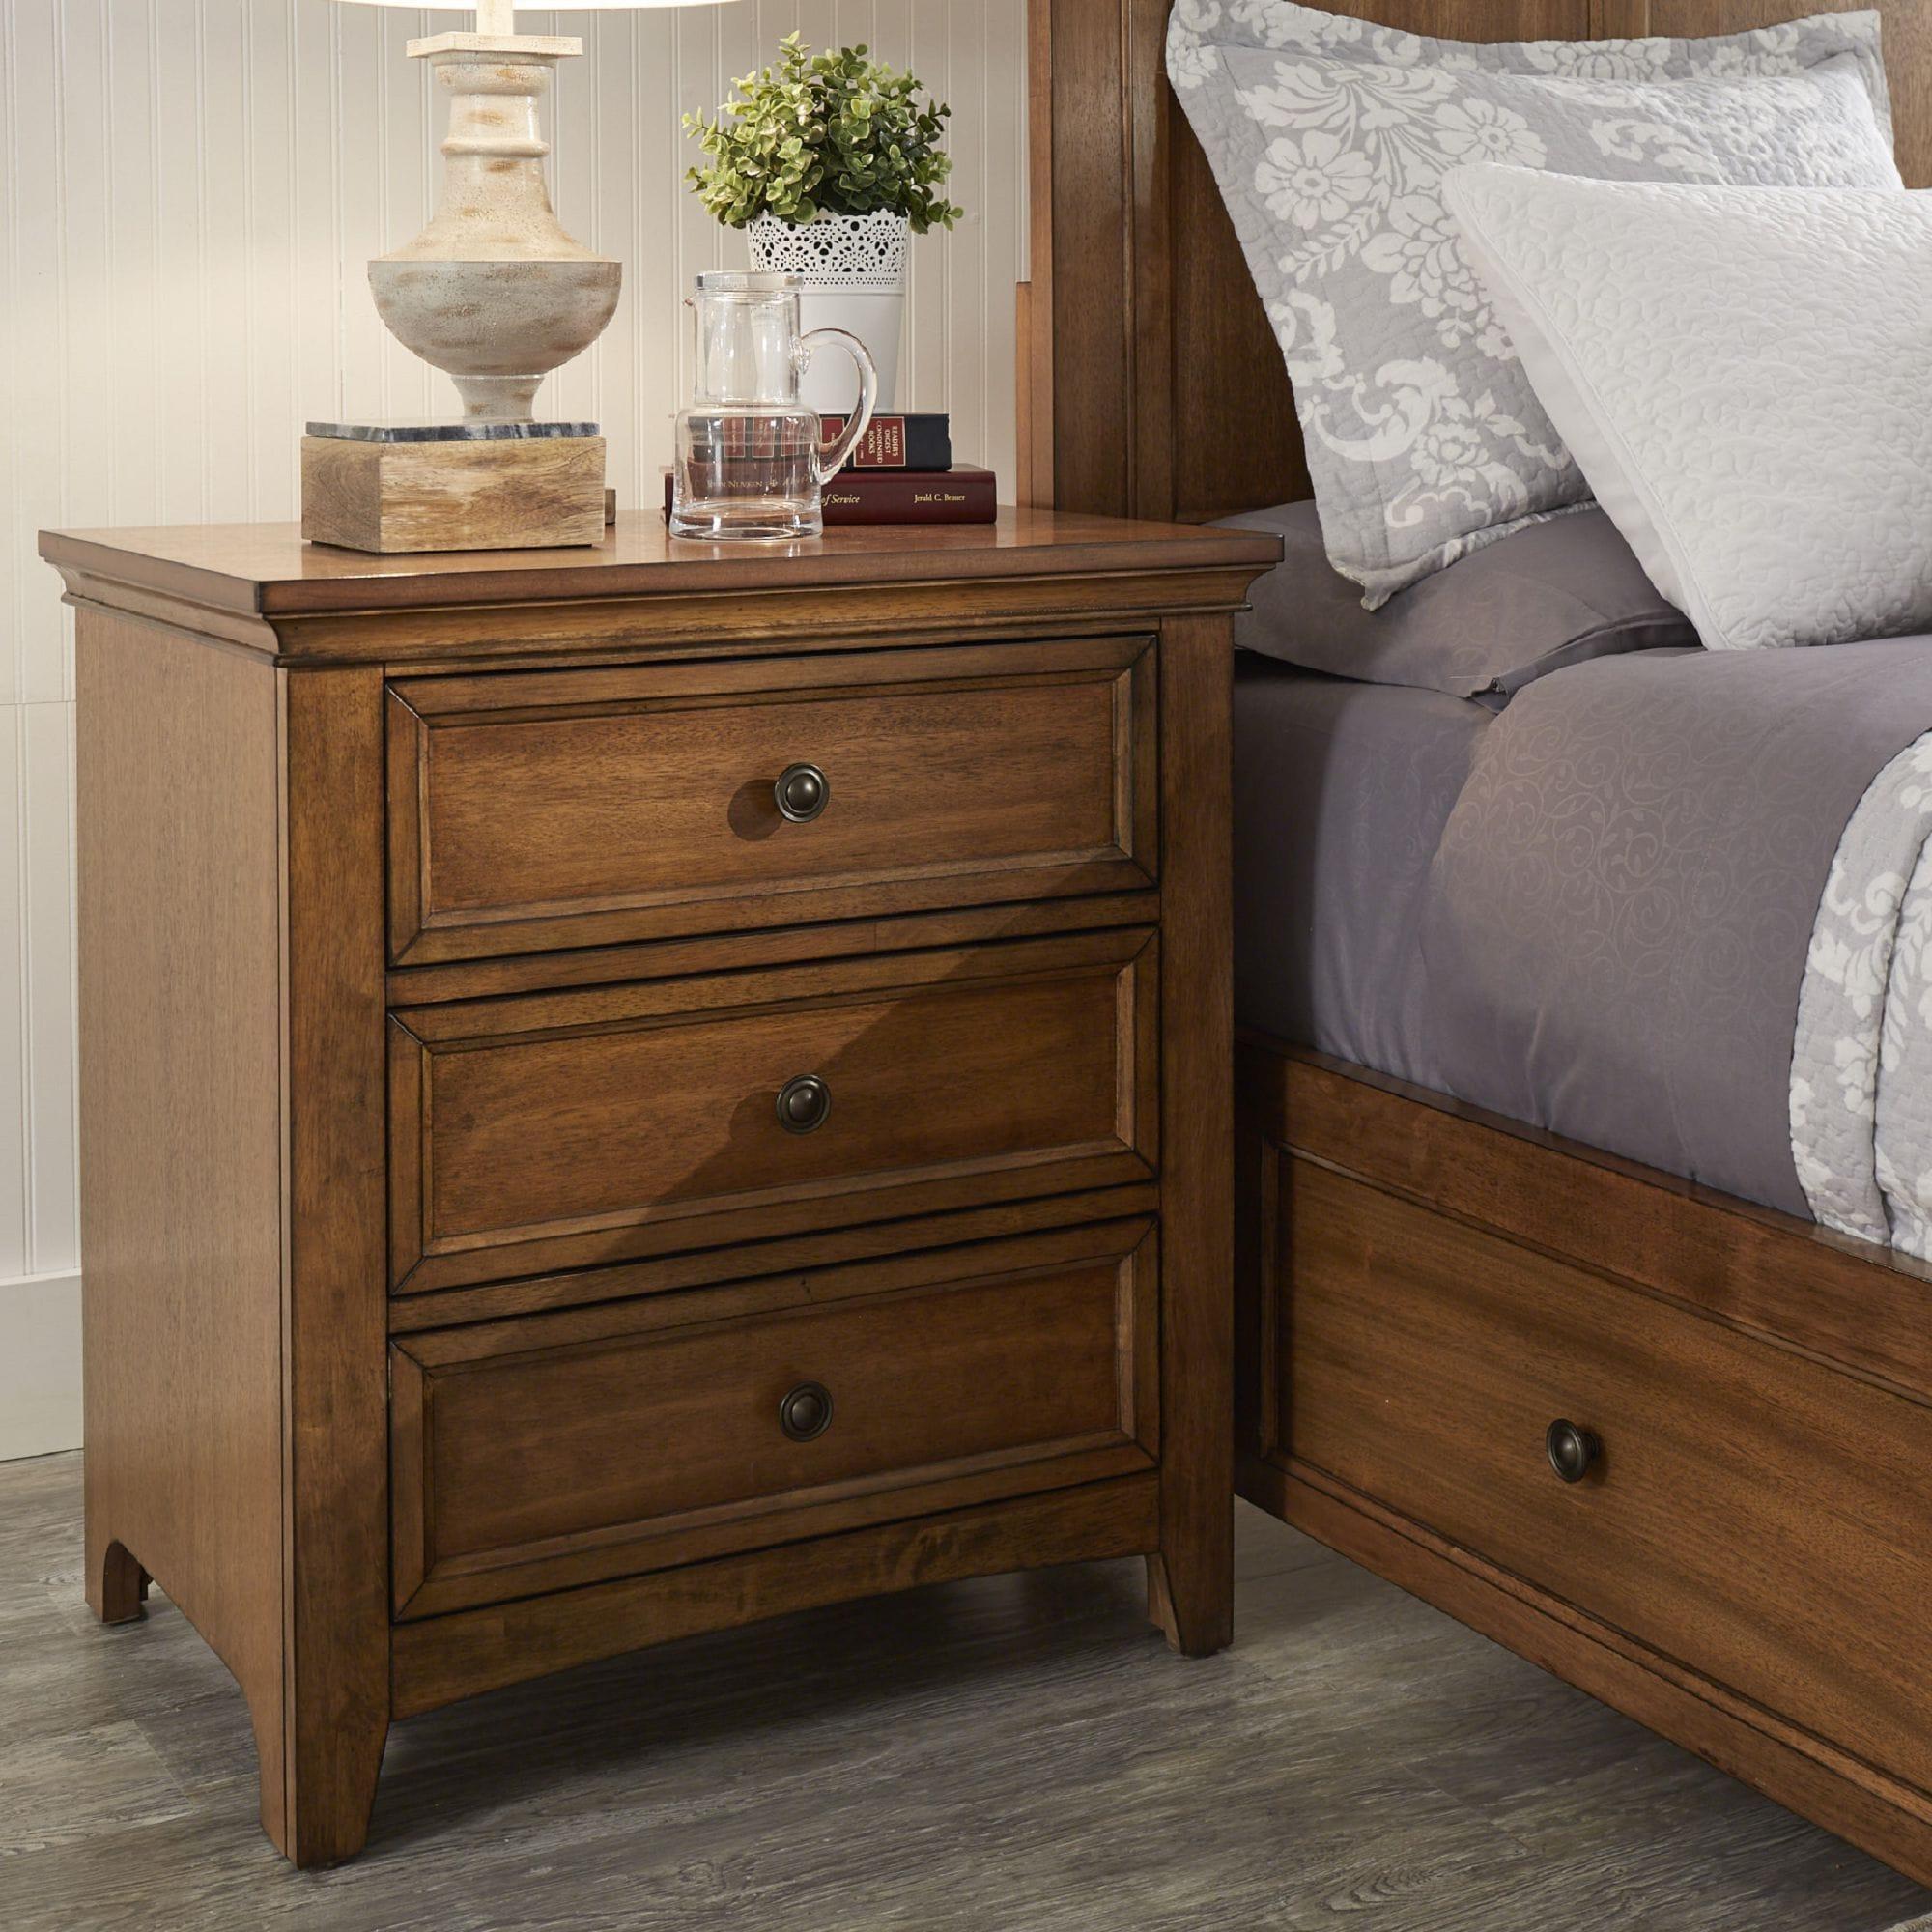 Ediline 3-drawer Wood Modular Storage Nightstand with Cha...